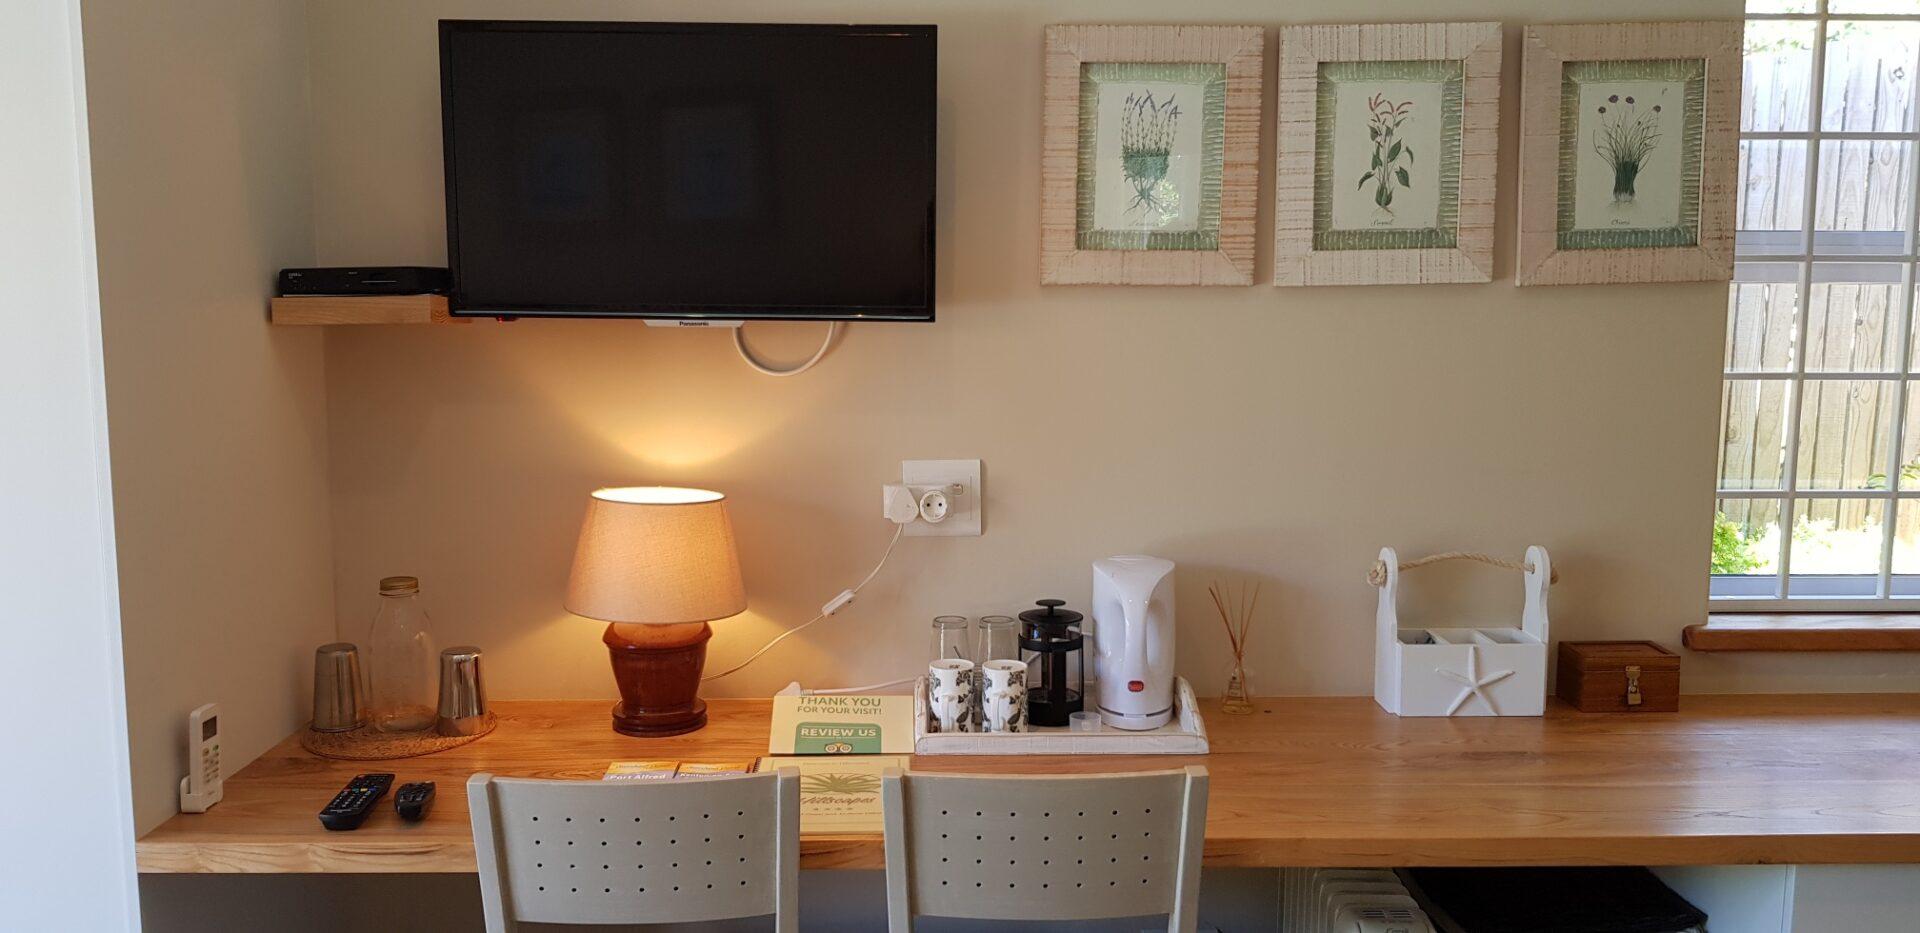 Jon's room - Desk and TV